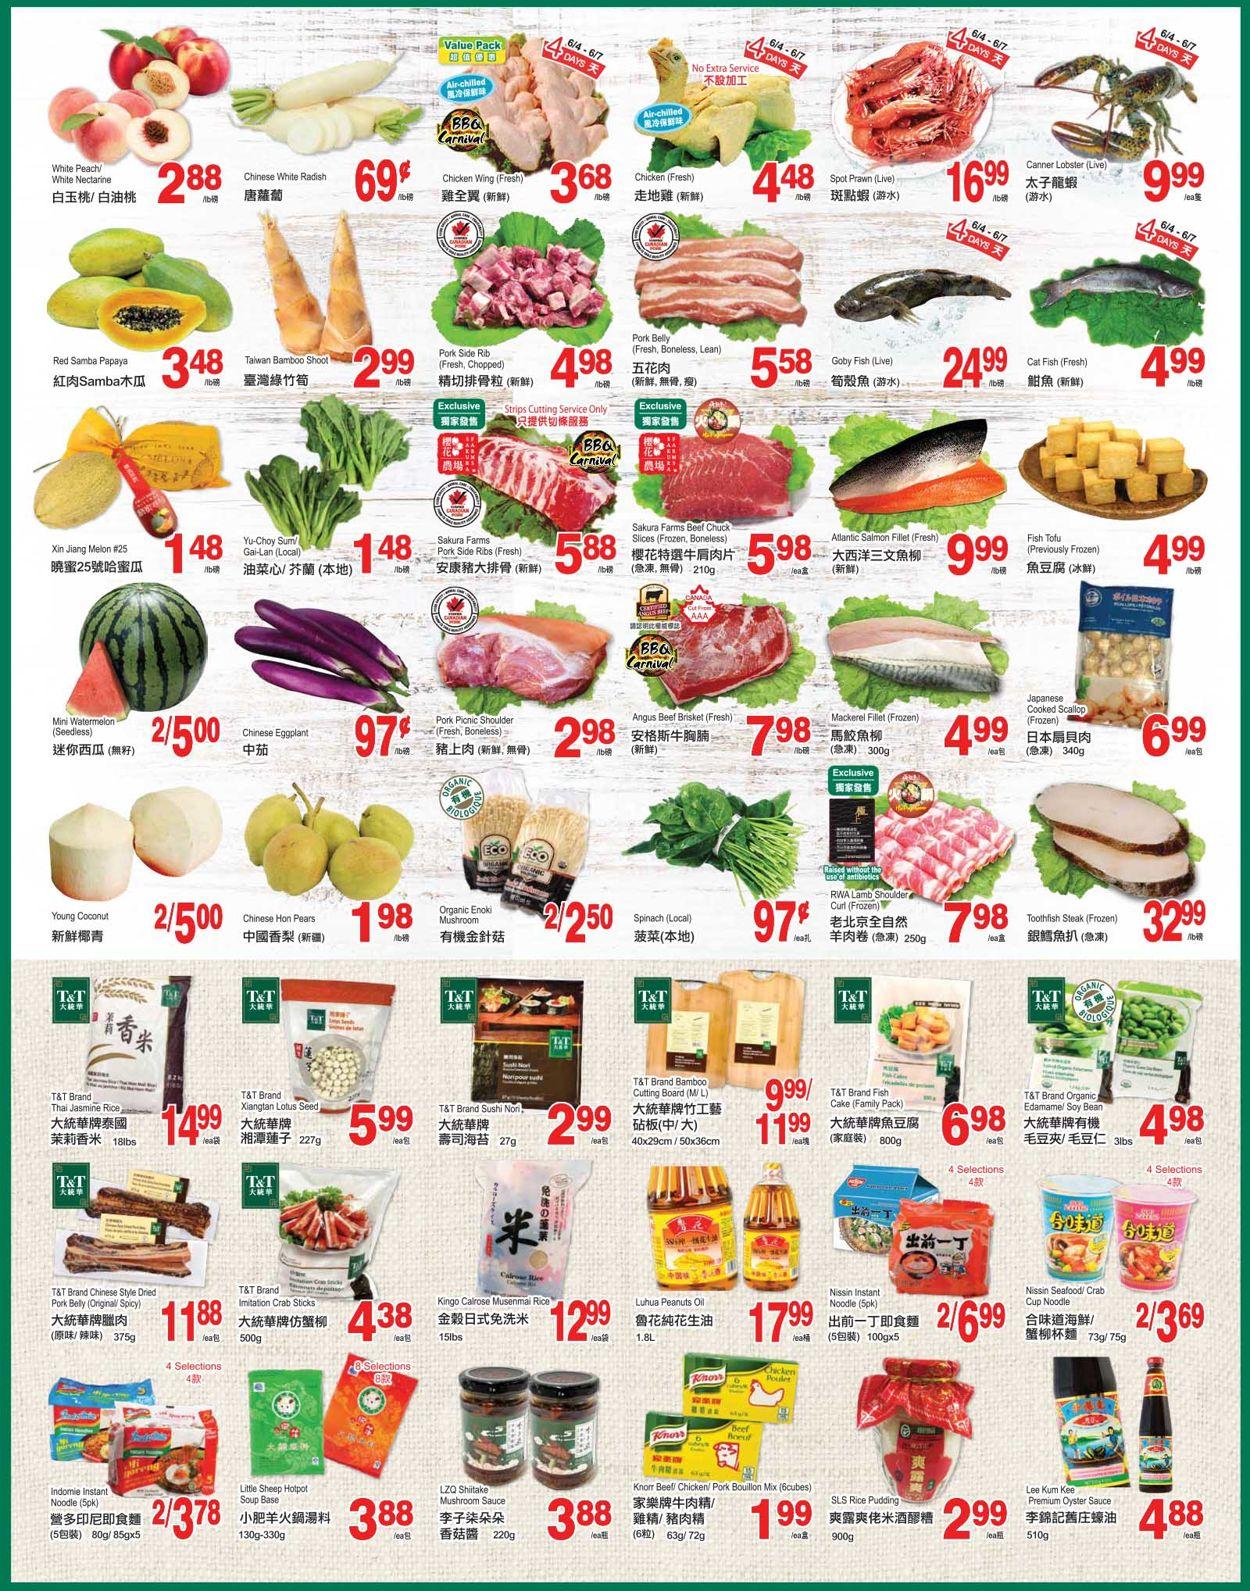 T&T Supermarket - British Columbia Flyer - 06/04-06/10/2021 (Page 2)